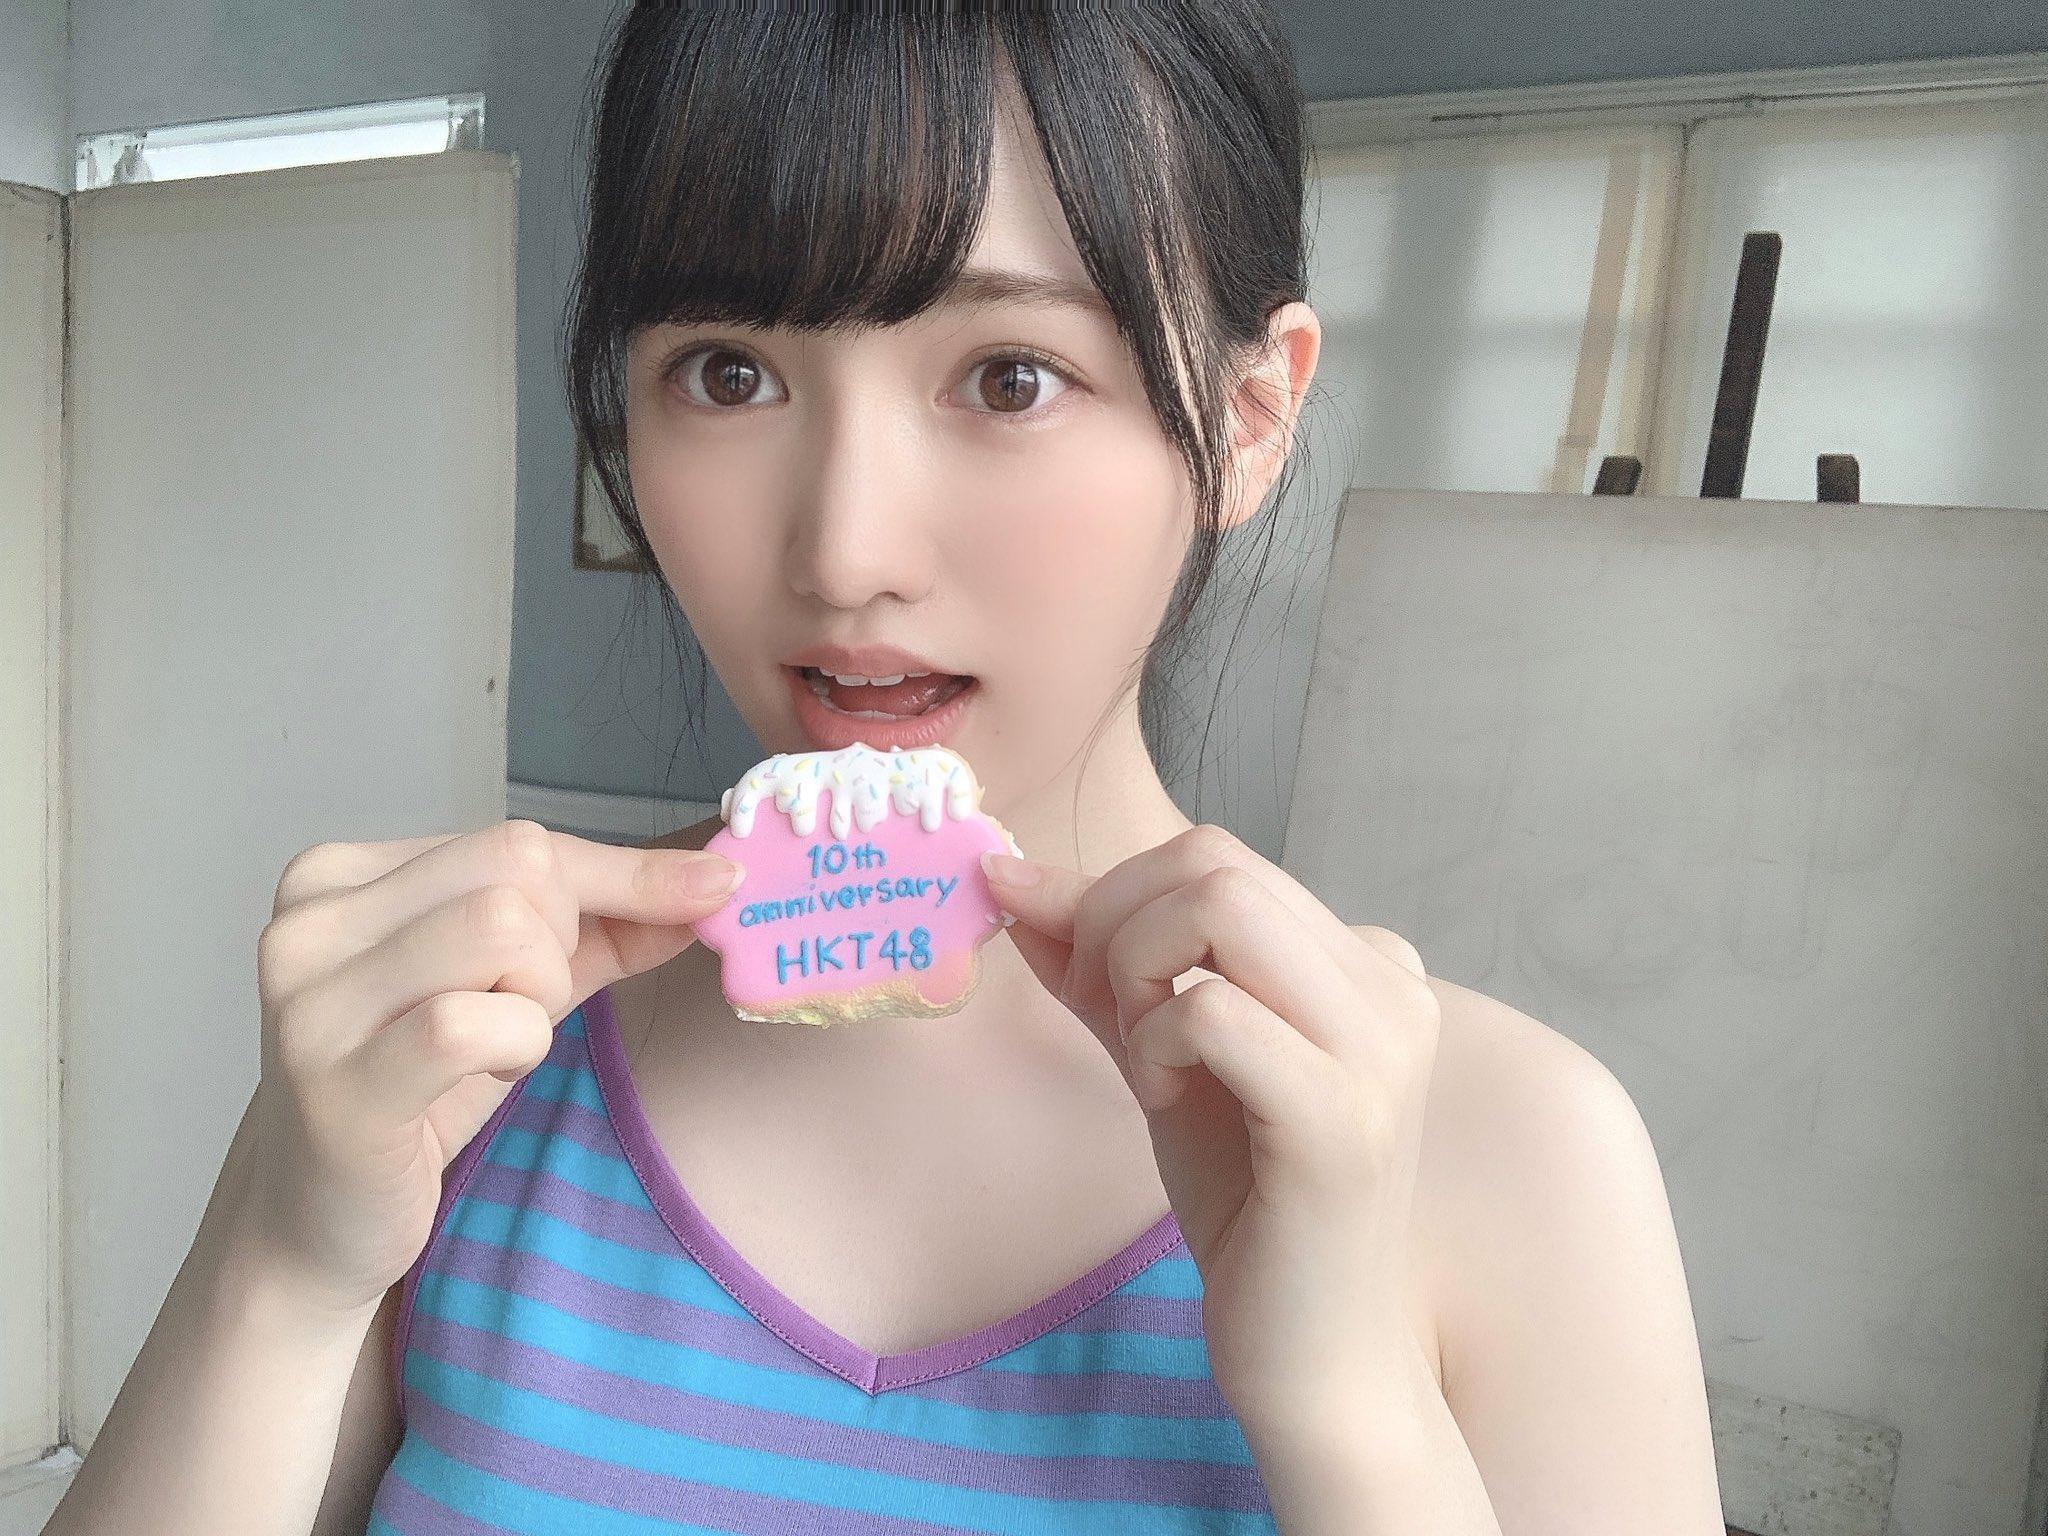 HKT48運上弘菜「美デコルテがセクシー!」『漫画アクション』撮影オフショット披露にファン歓喜【画像2枚】の画像001